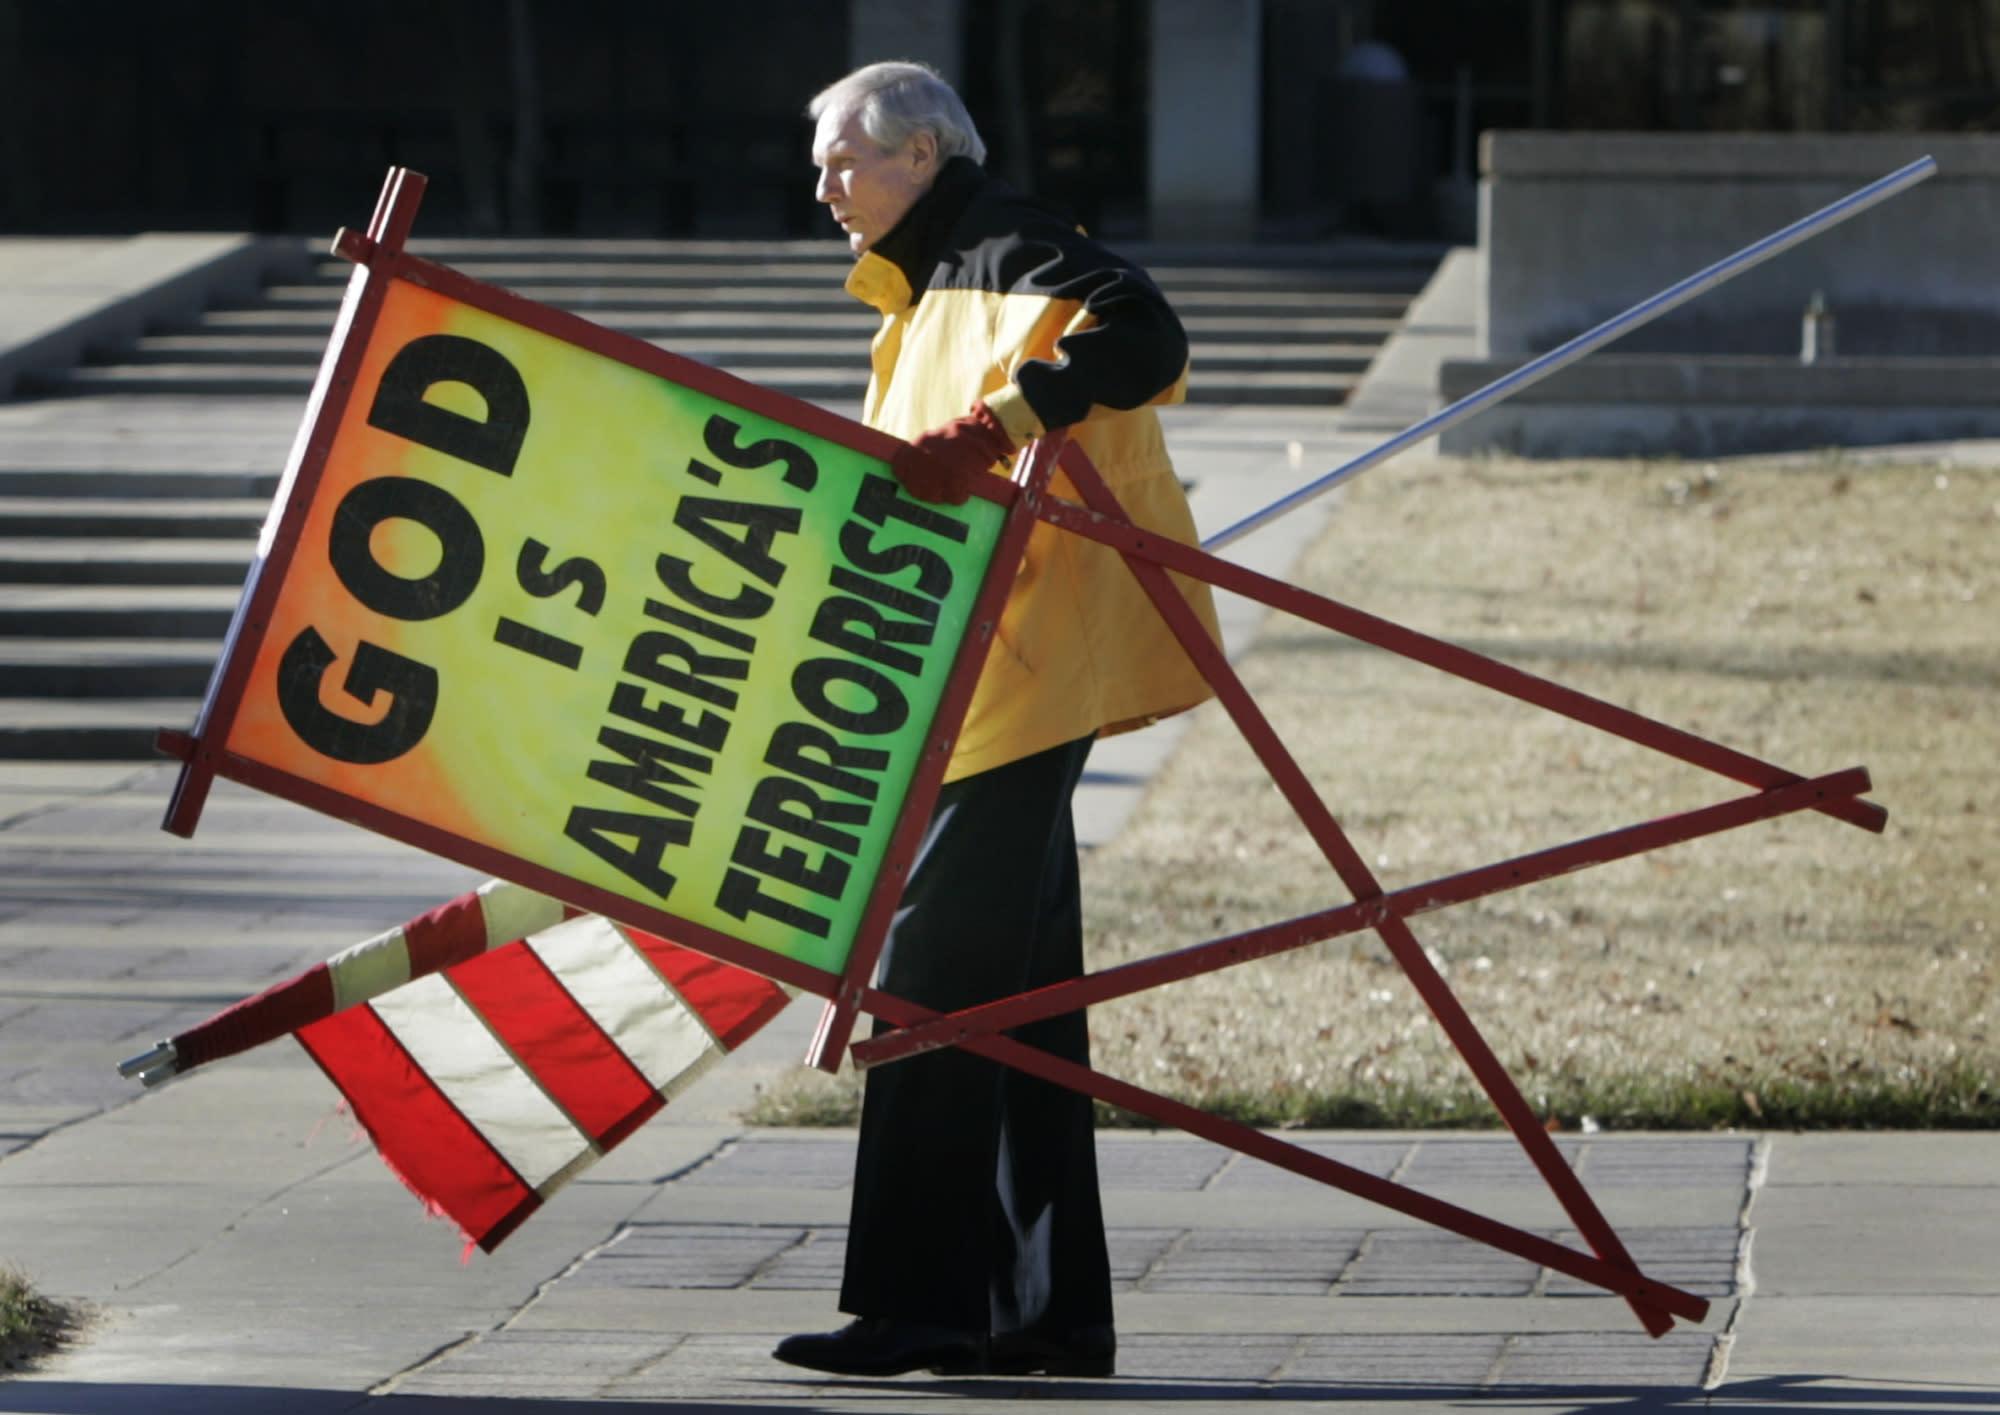 How westboro baptist church's neighbors counter hate